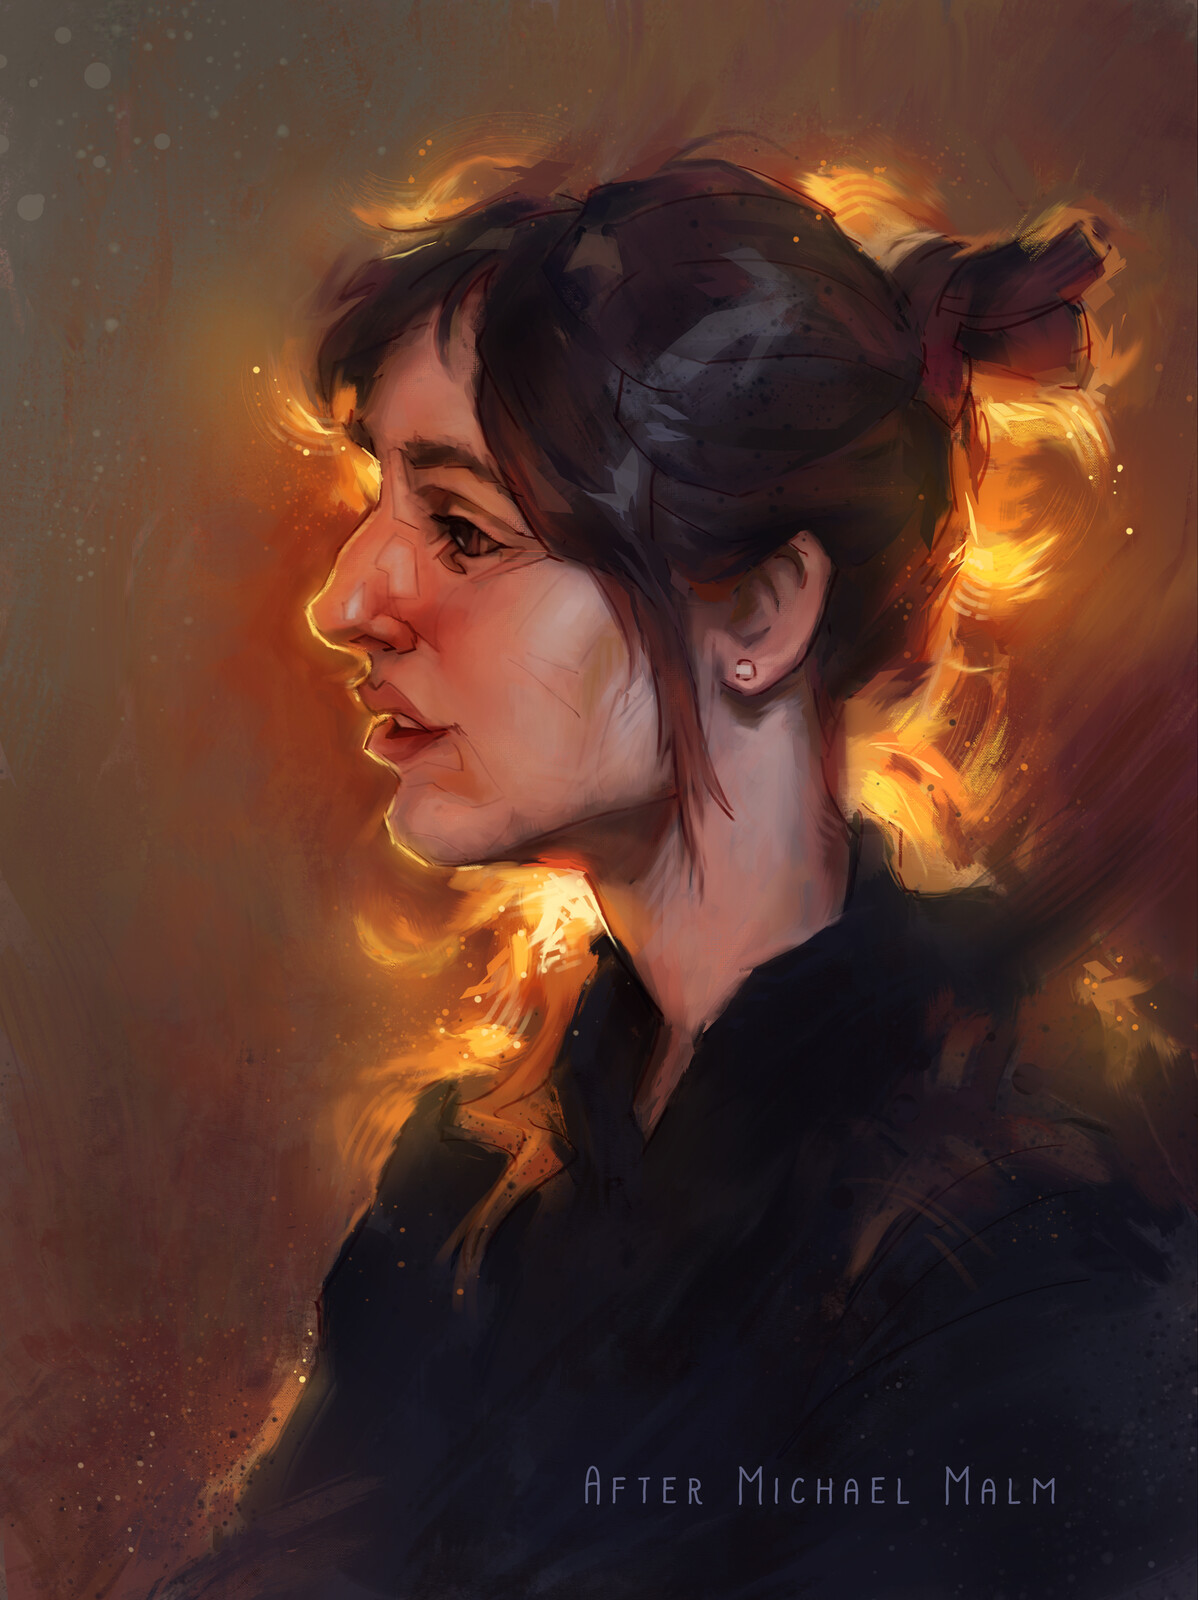 Michael Malm Portrait Study